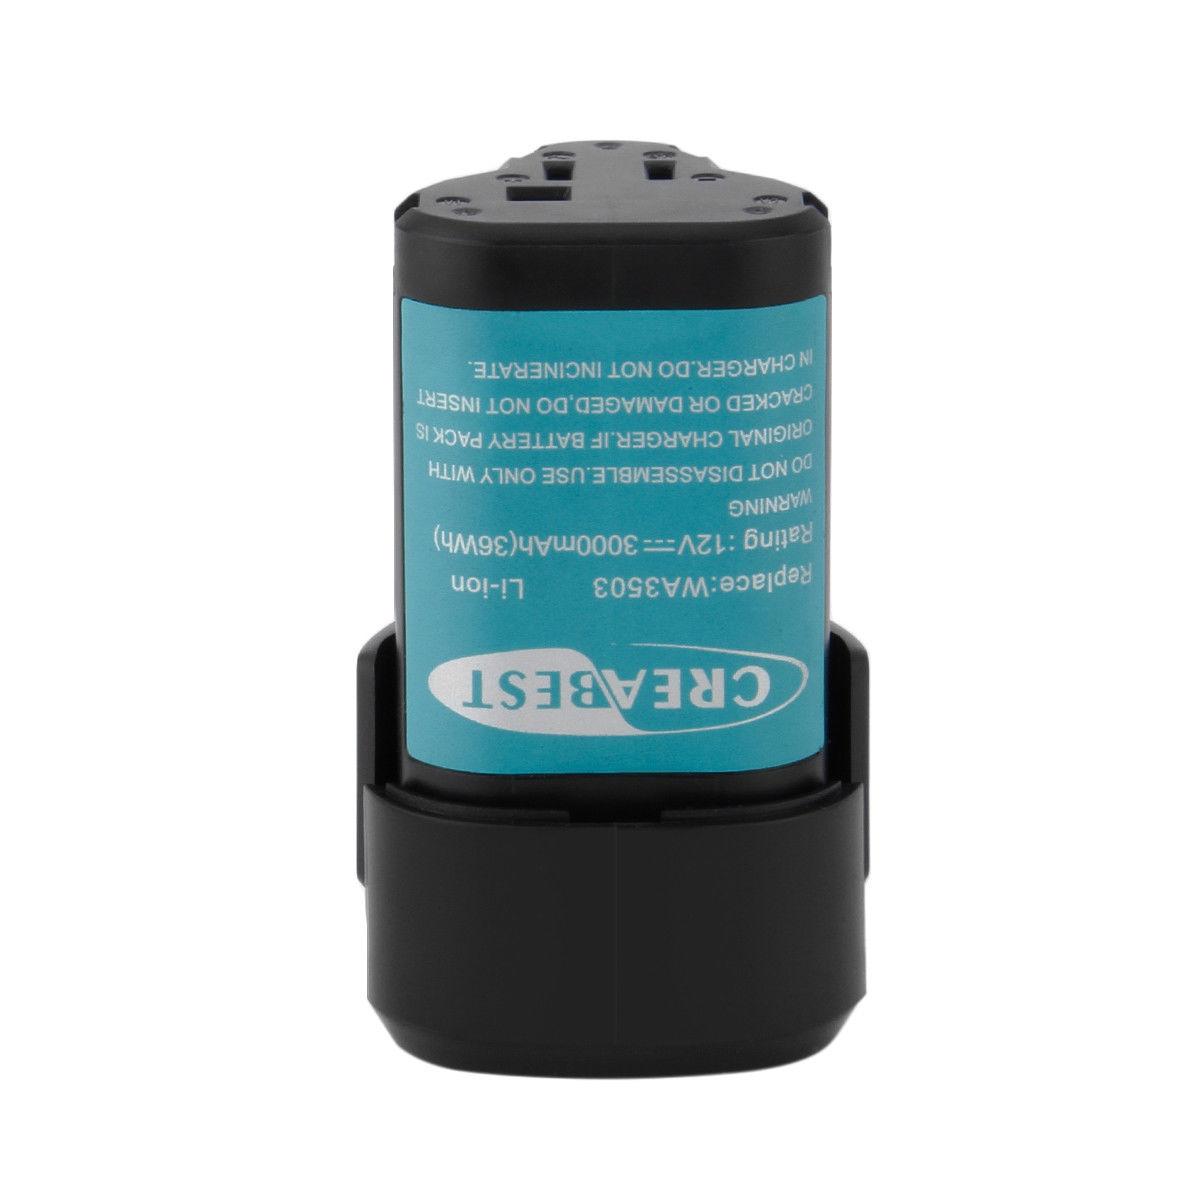 Batterie 3000mAh 12V WA3503 WA3509 Lithium Worx WX125 WU288 WX126 WX128.2(compatible)